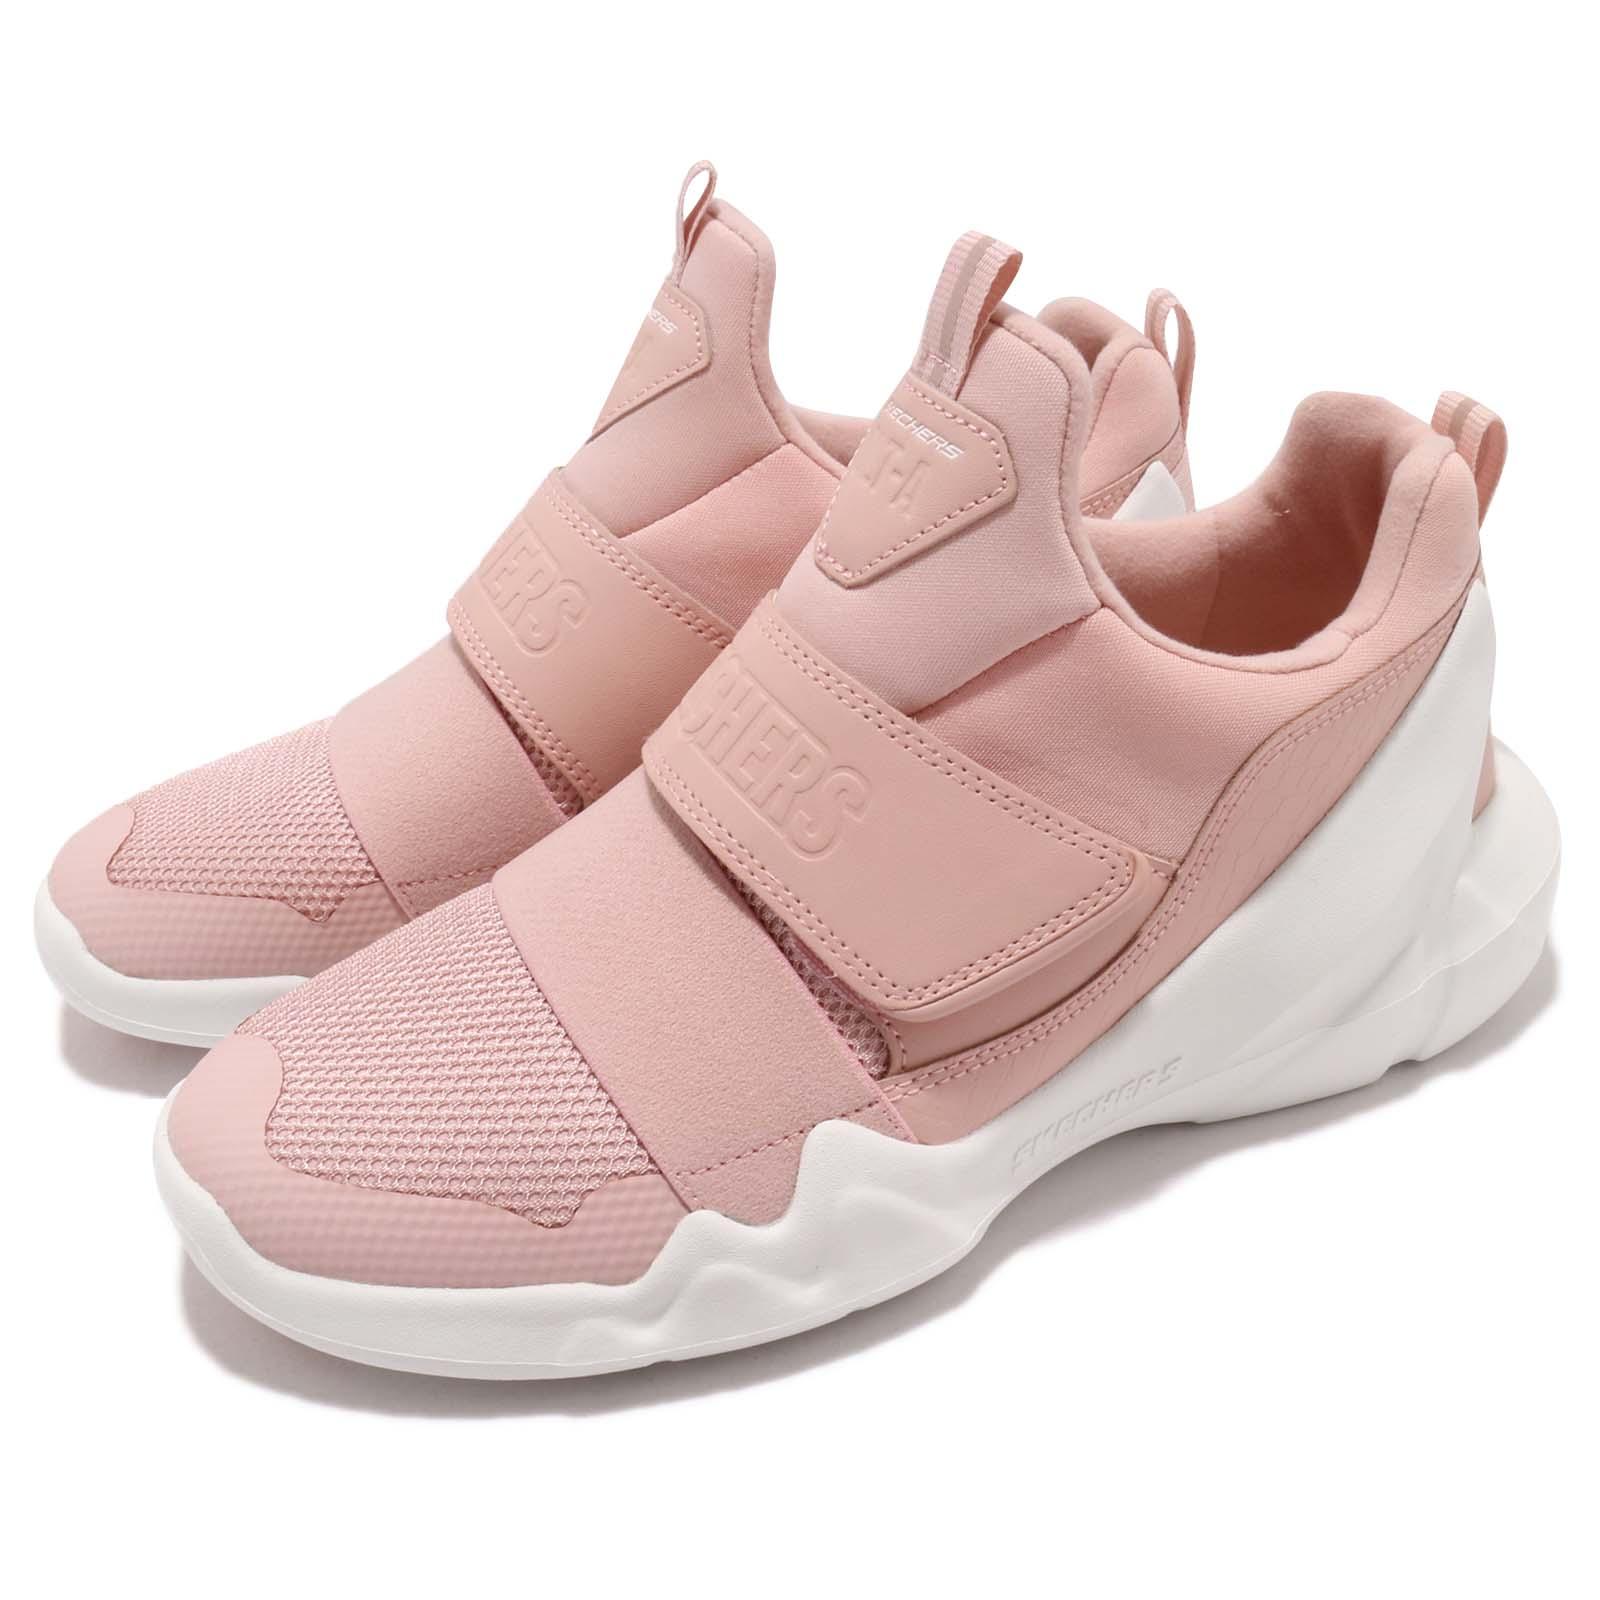 Skechers 慢跑鞋 D Lites DLT-A 女鞋 66666085PNK